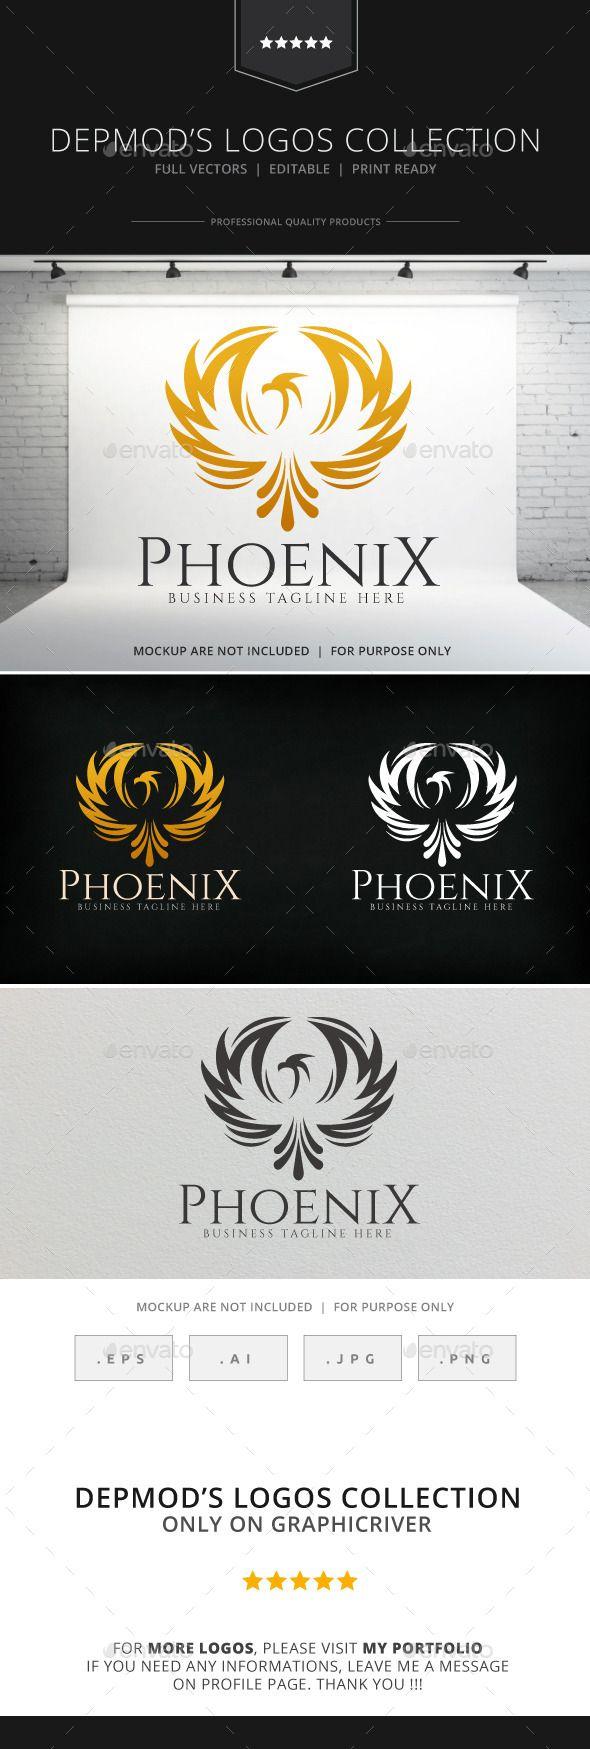 Phoenix Logo — Transparent PNG #antique #consult • Available here → https://graphicriver.net/item/phoenix-logo/8930982?ref=pxcr